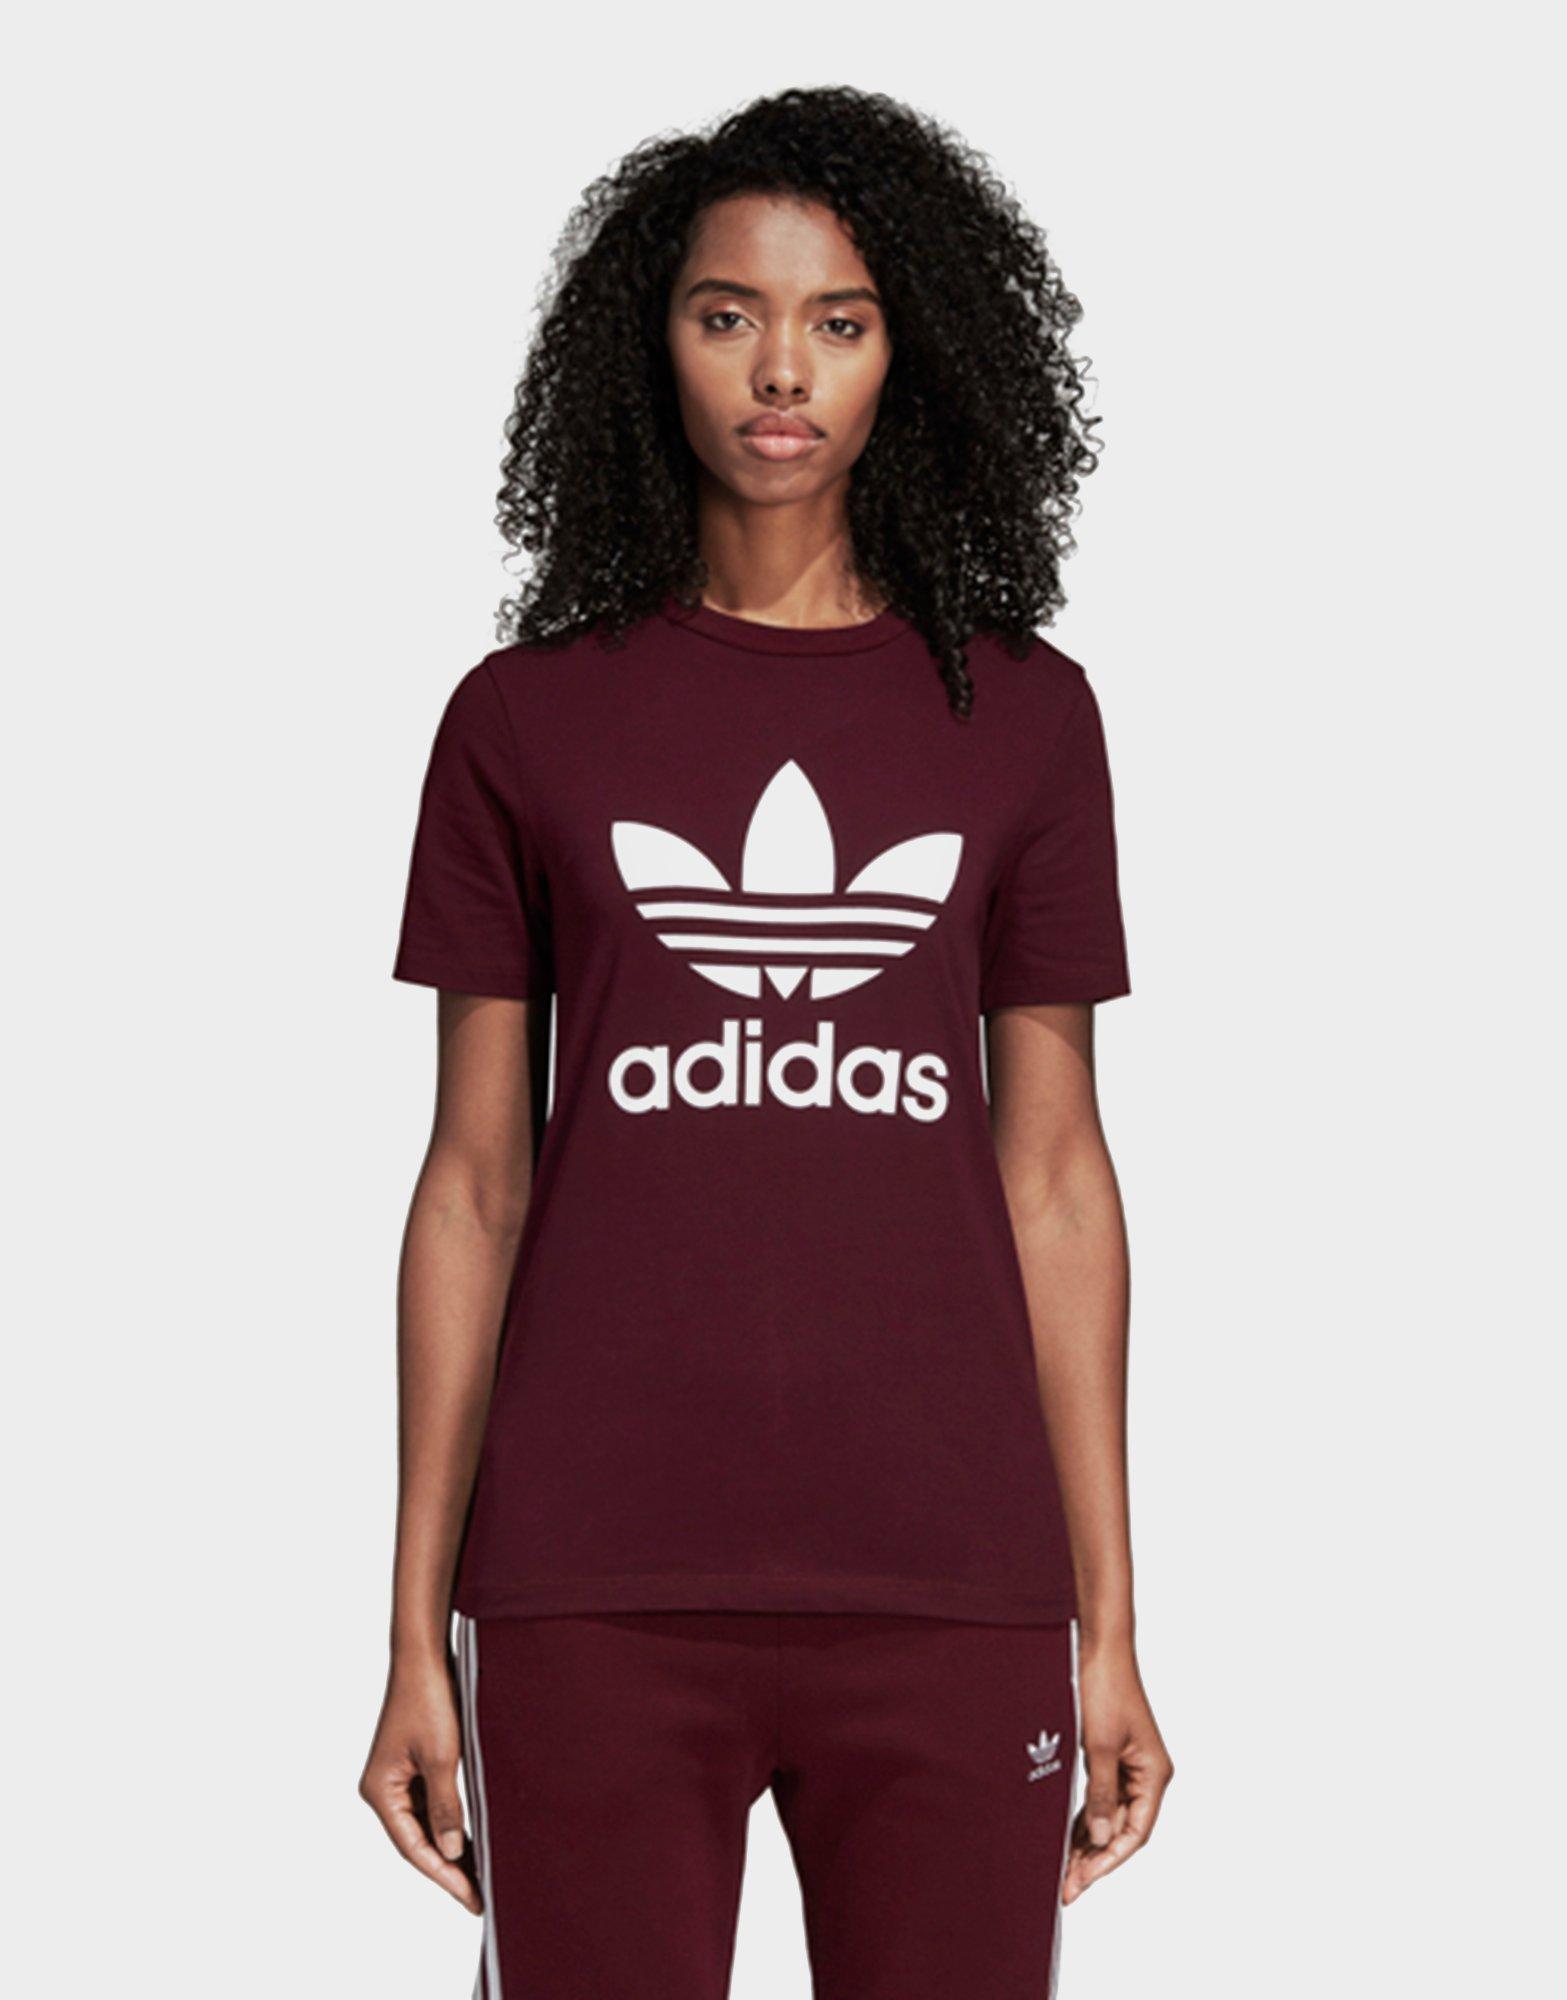 e79d13f1c94 Adidas - Red Trefoil Tee - Lyst. View fullscreen